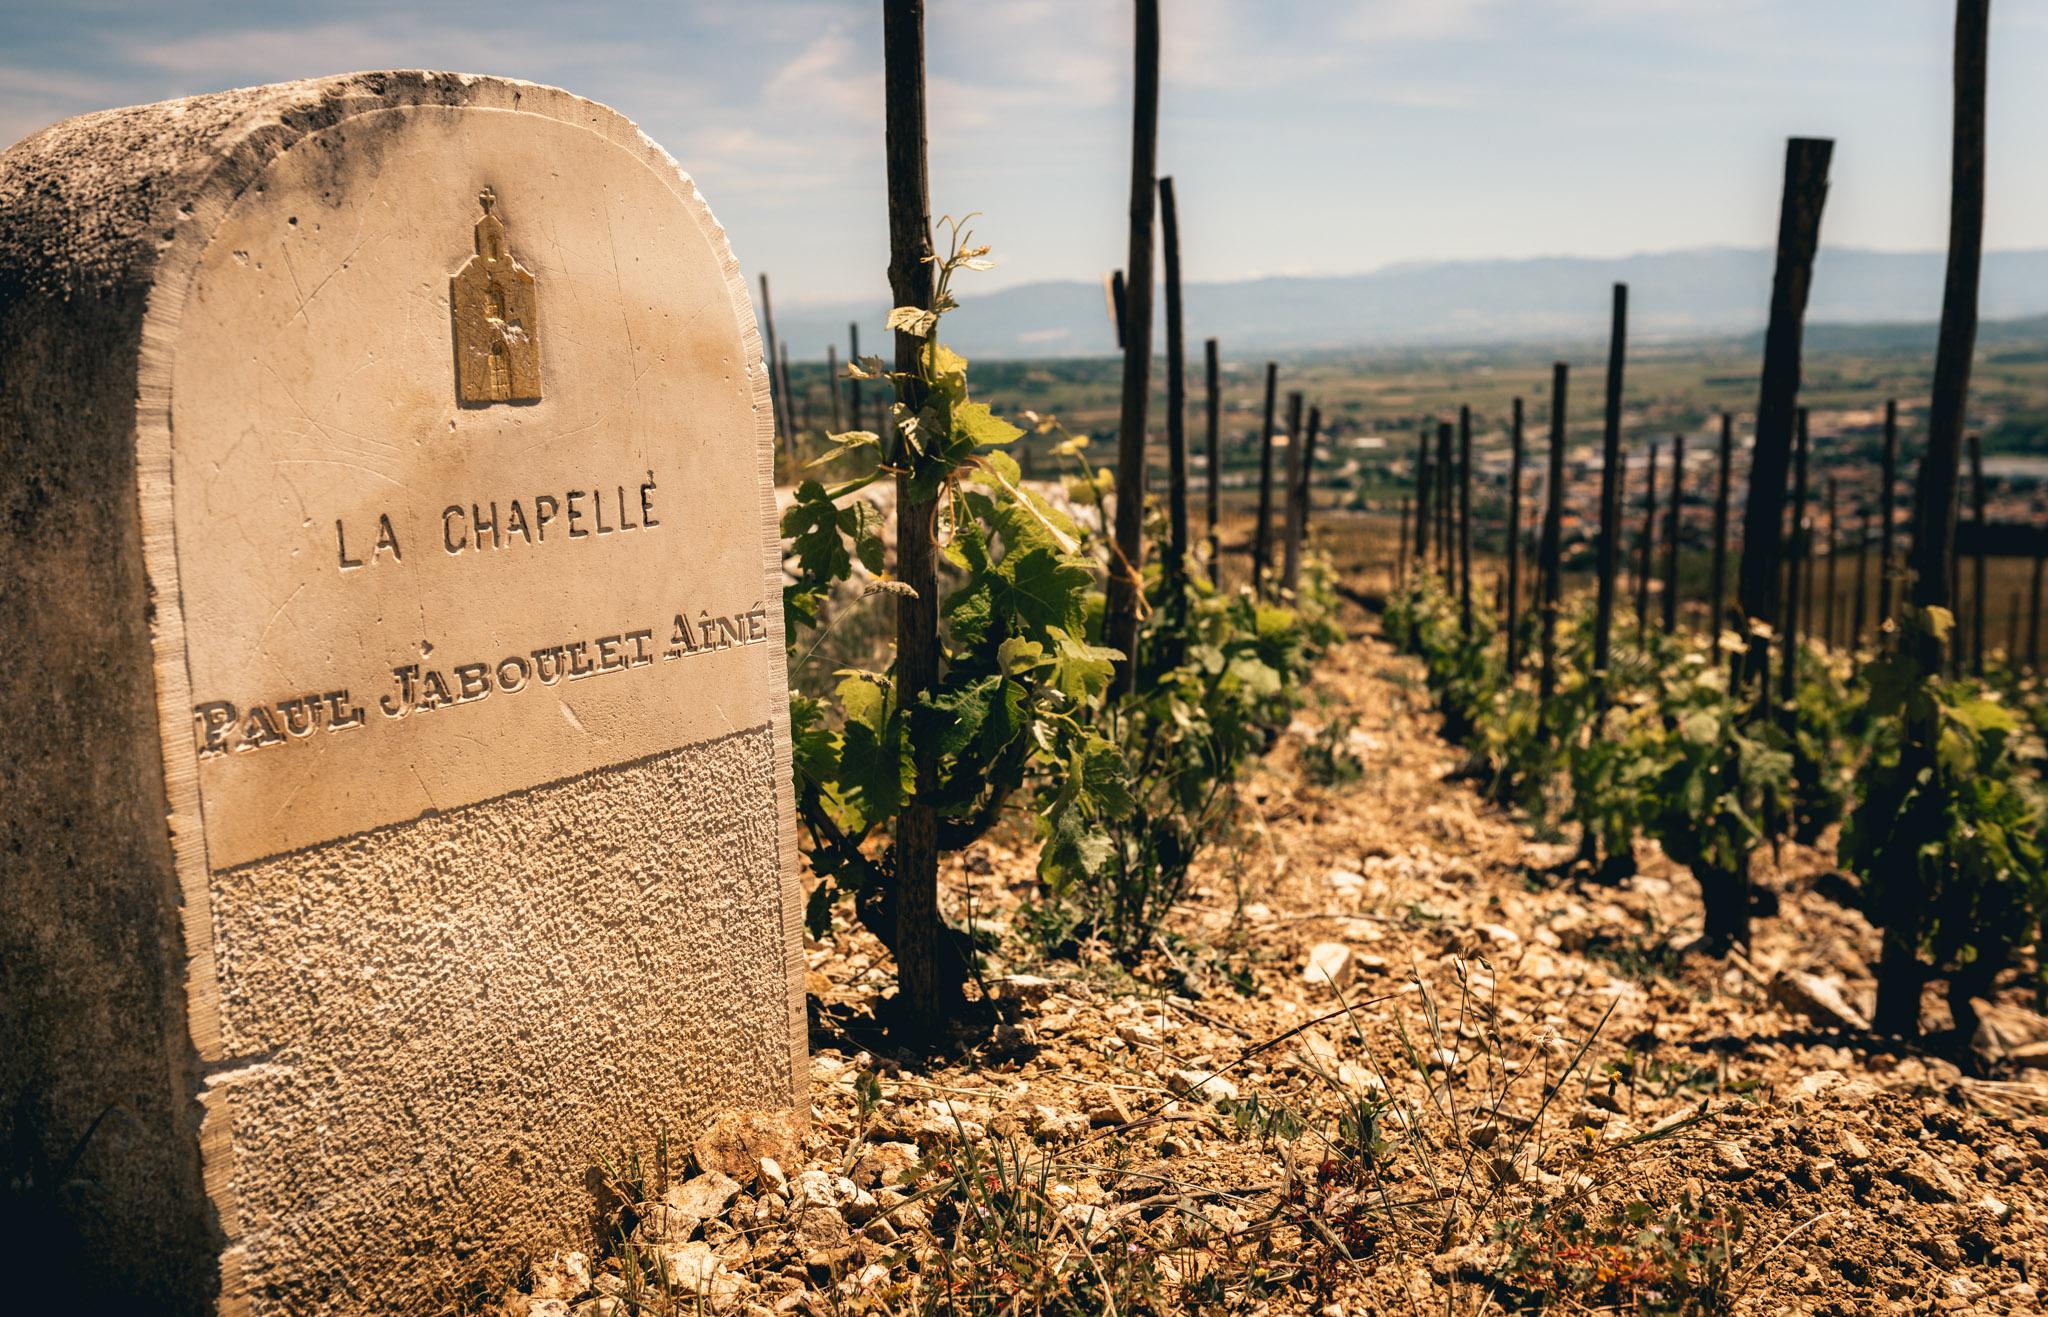 France : Northern Rhone : l'Ermite vineyard